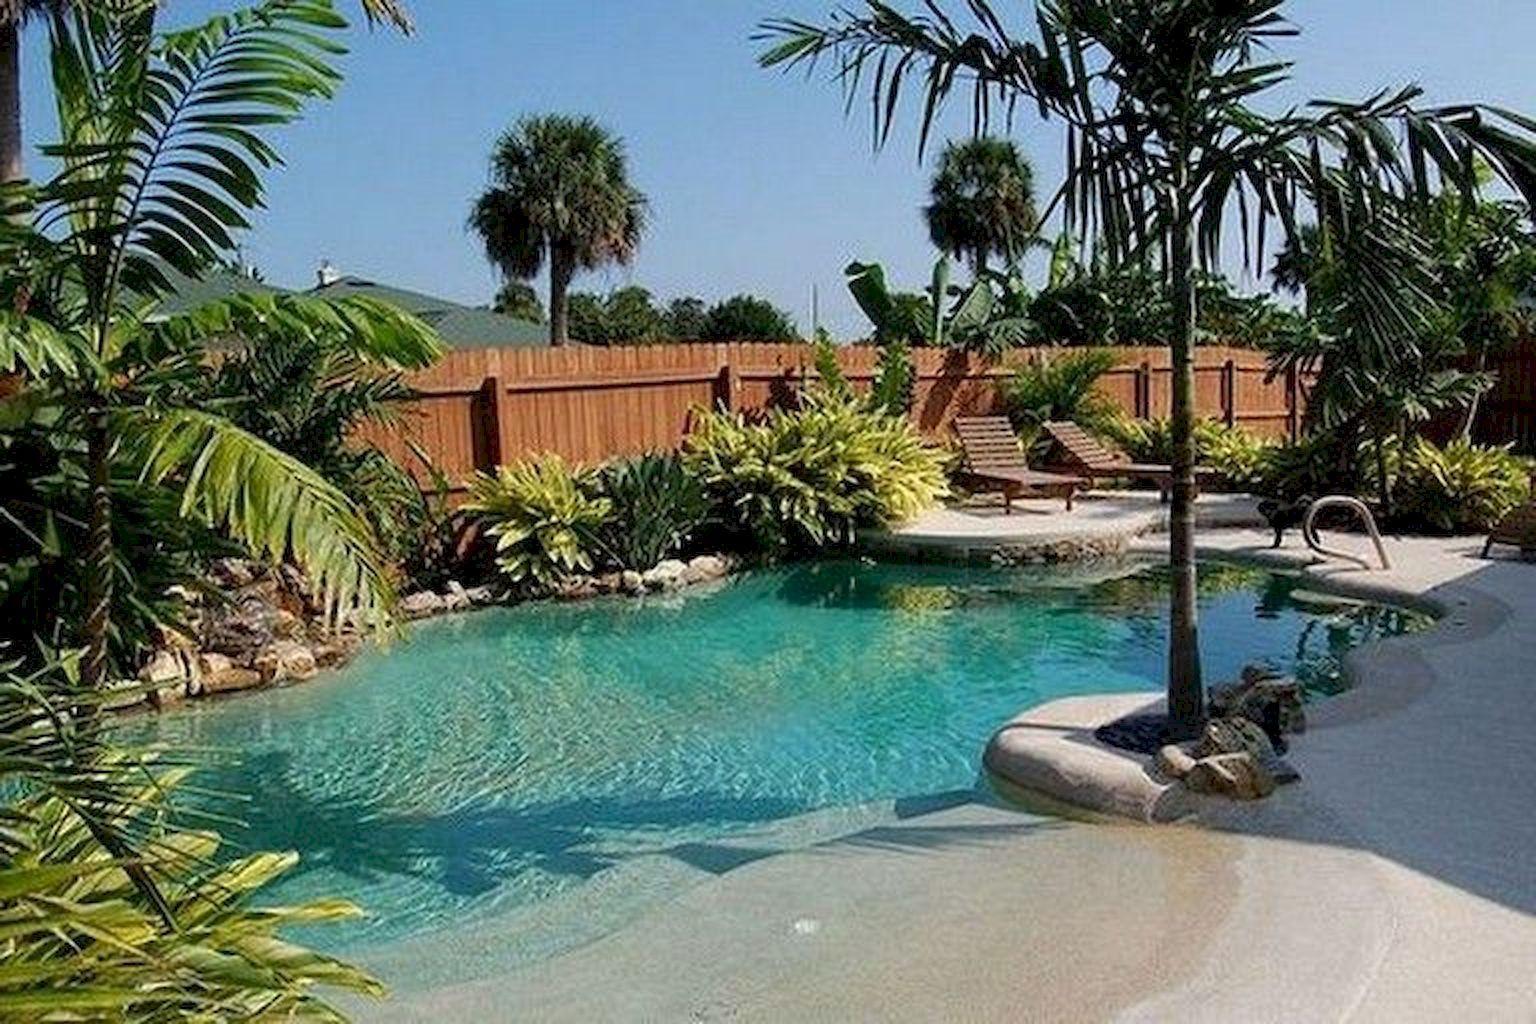 Swimming Pool Designs for Maximum Fun and Enjoyment ... on Backyard Beach Landscape Design id=36836